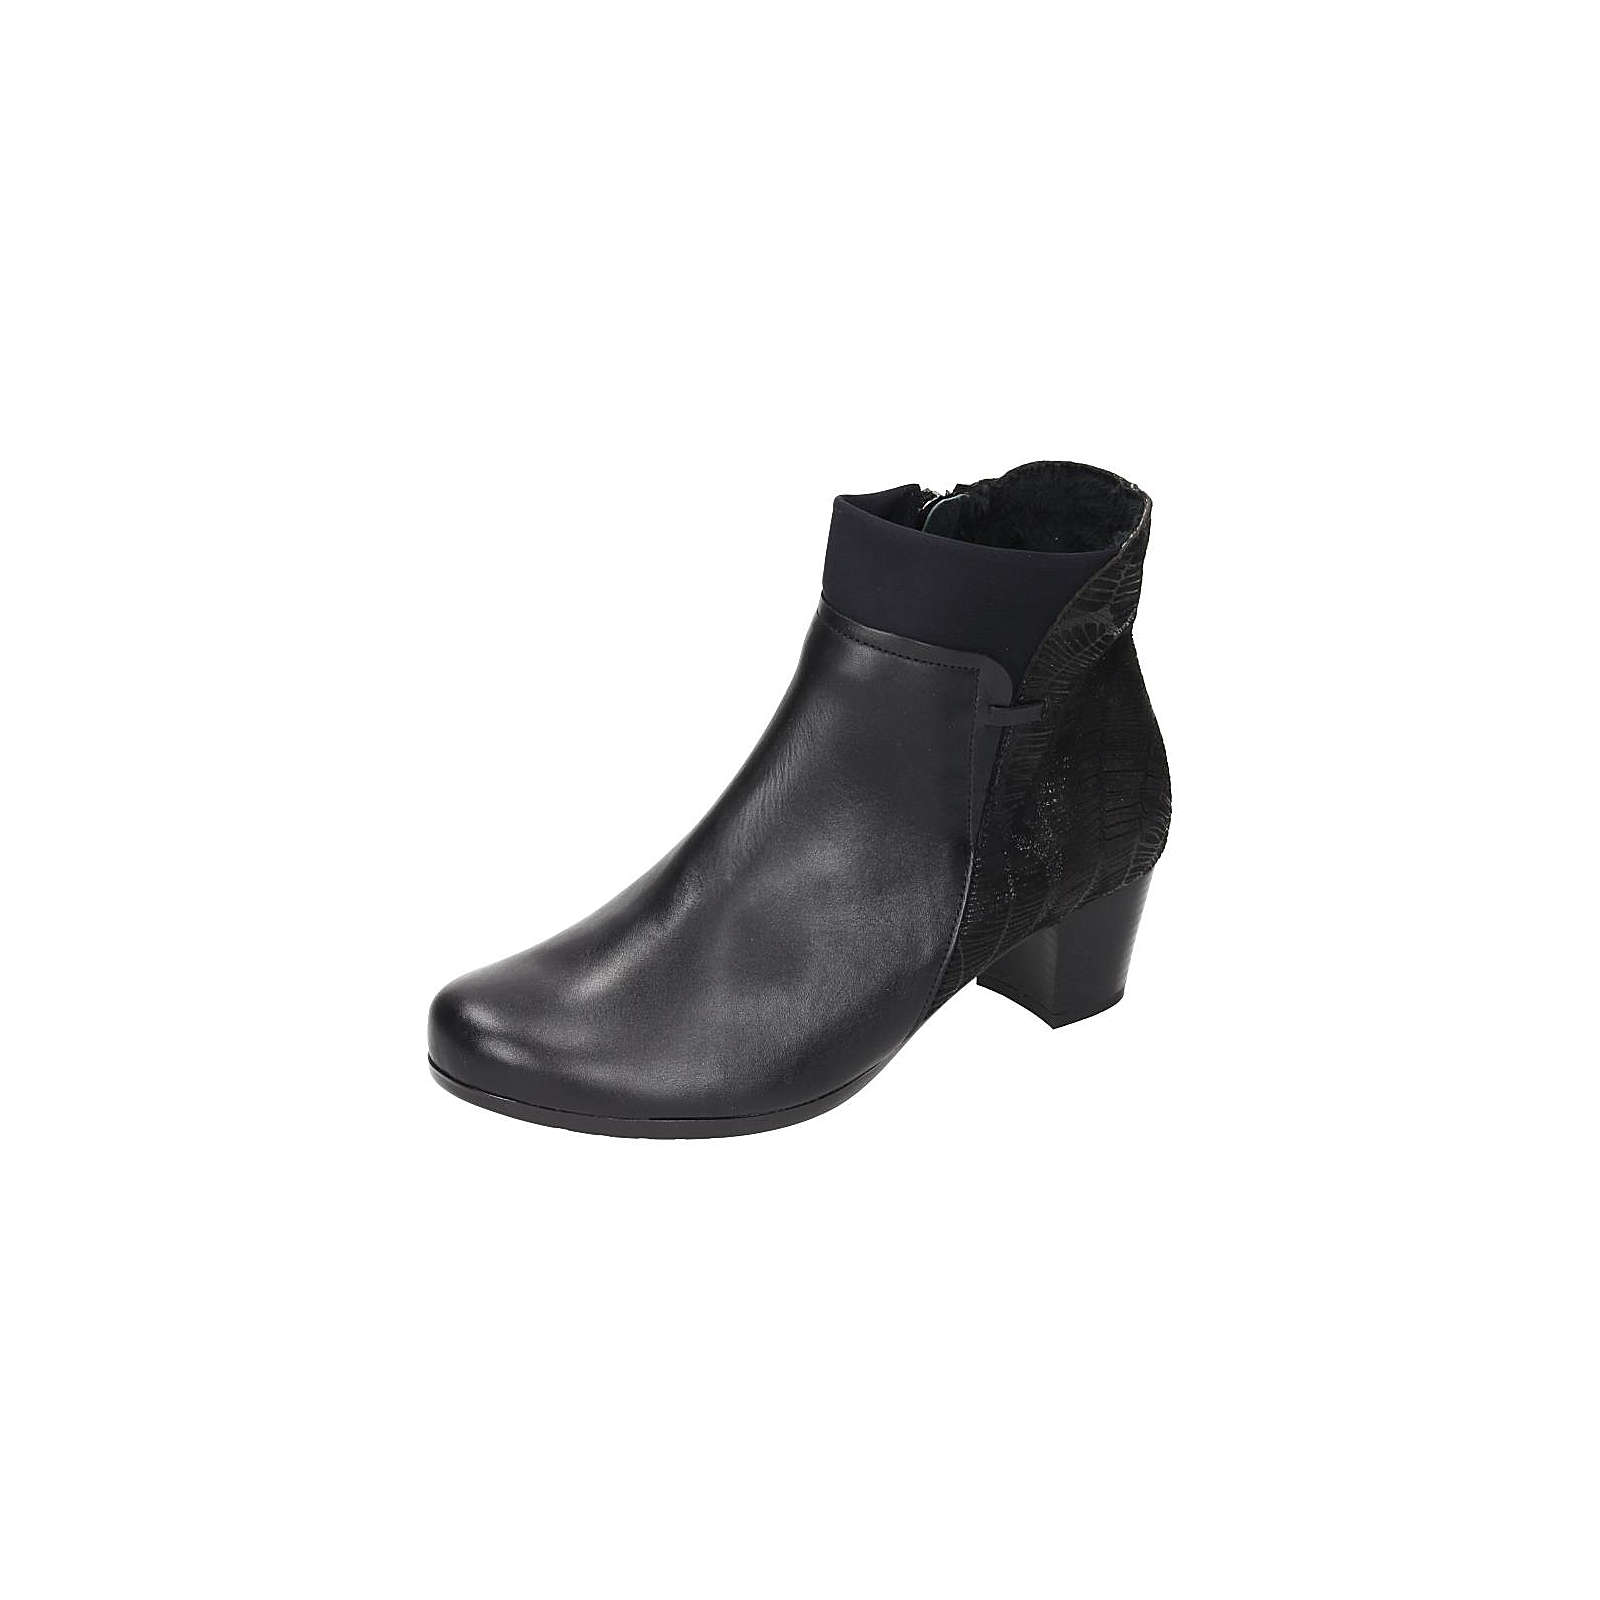 Comfortabel Damen Stiefelette schwarz Damen Gr. 39